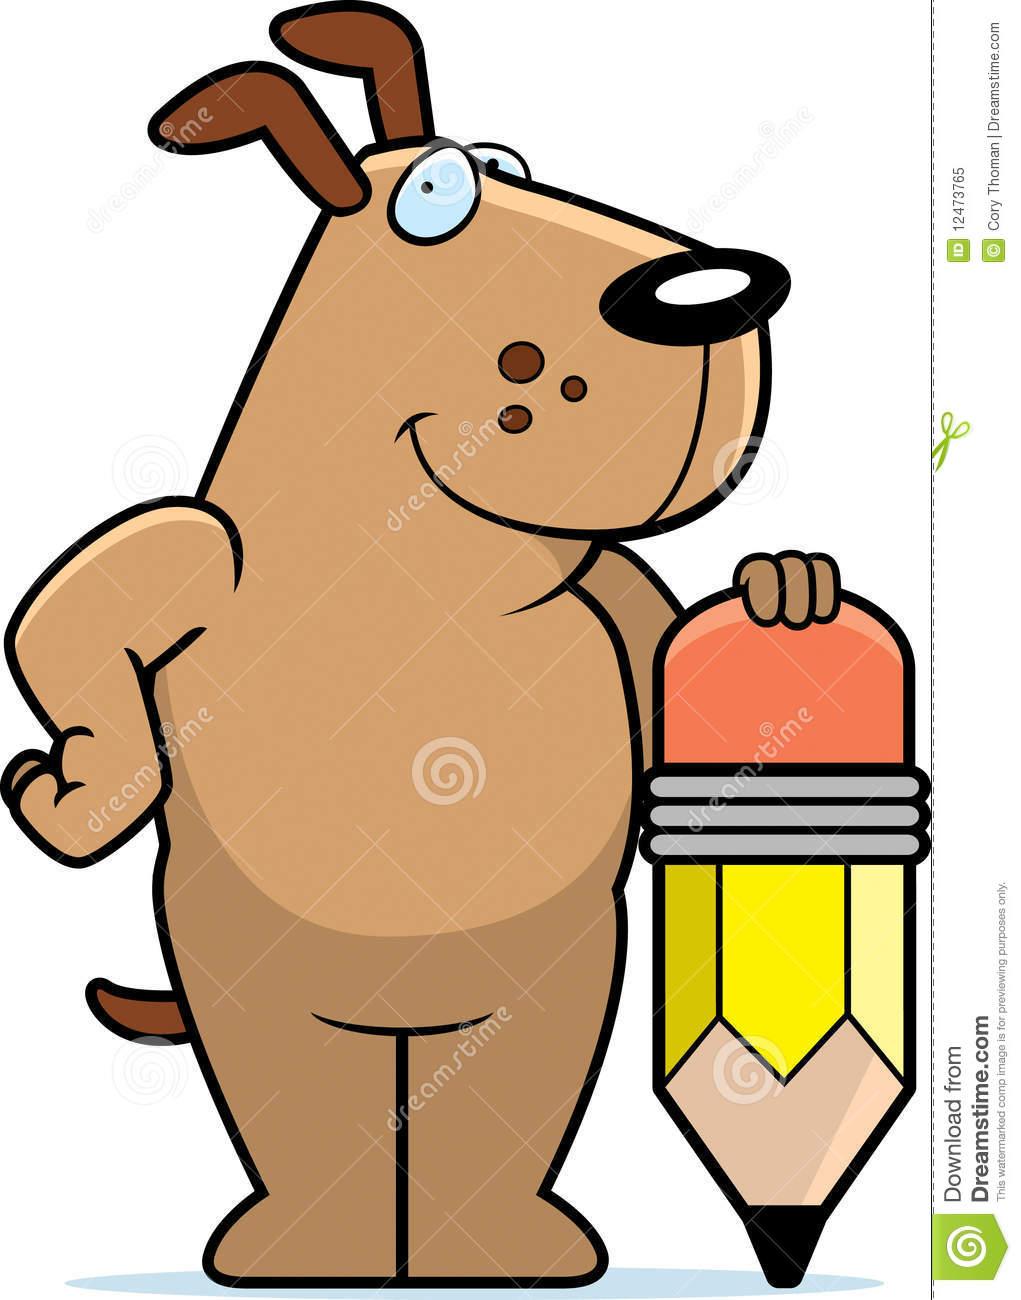 Dog Pencil Royalty Free Stock Photo.